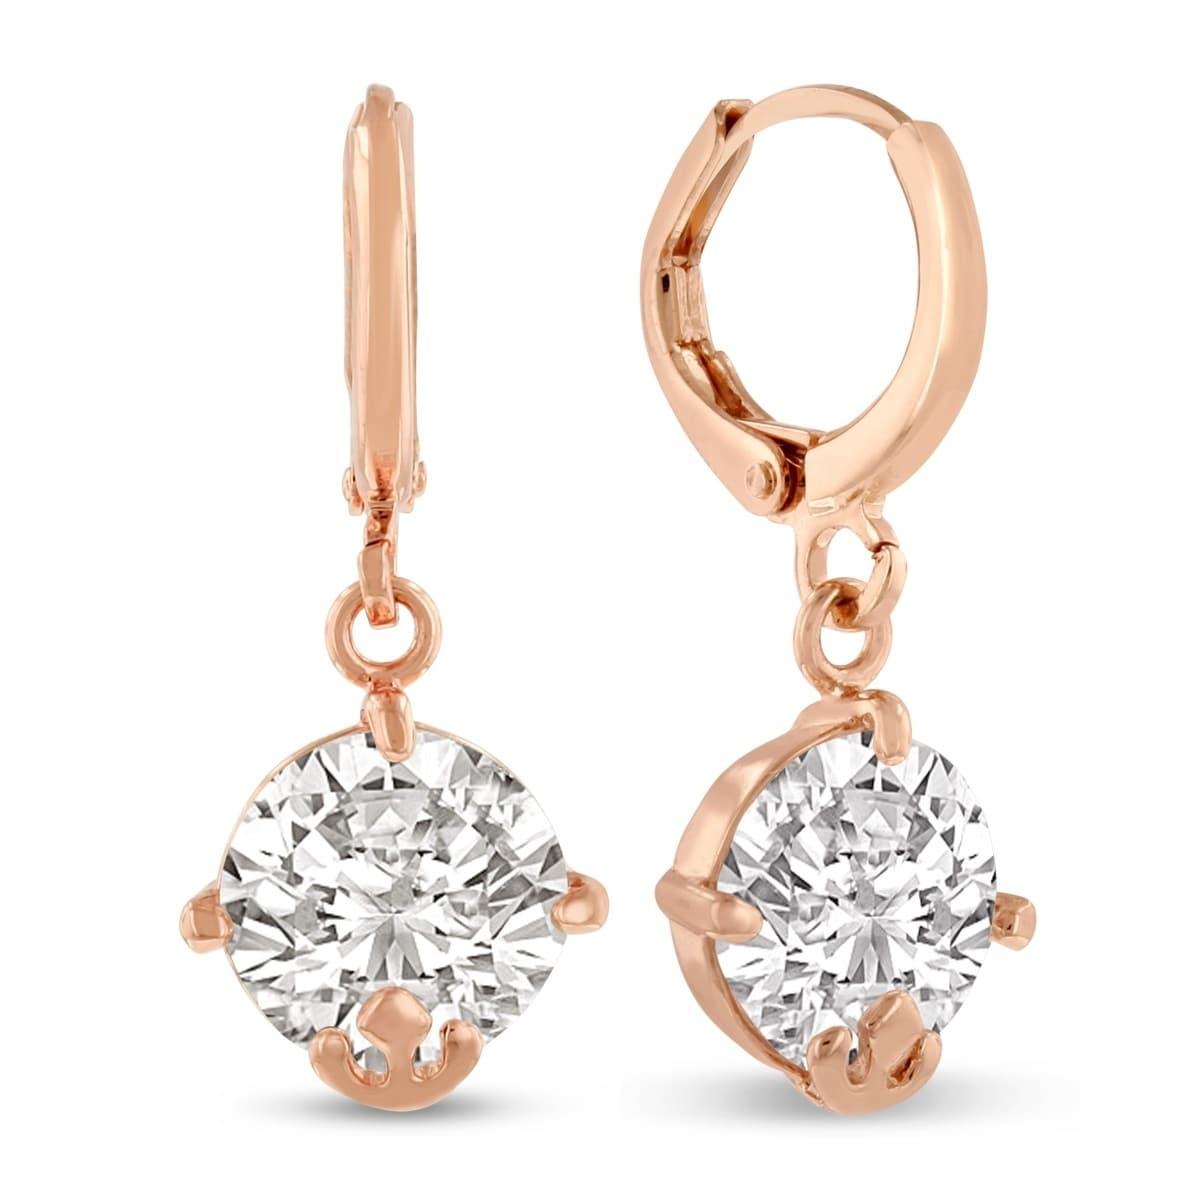 Szul 5 Carat Swarovski Elements Crystal Hoop Earrings